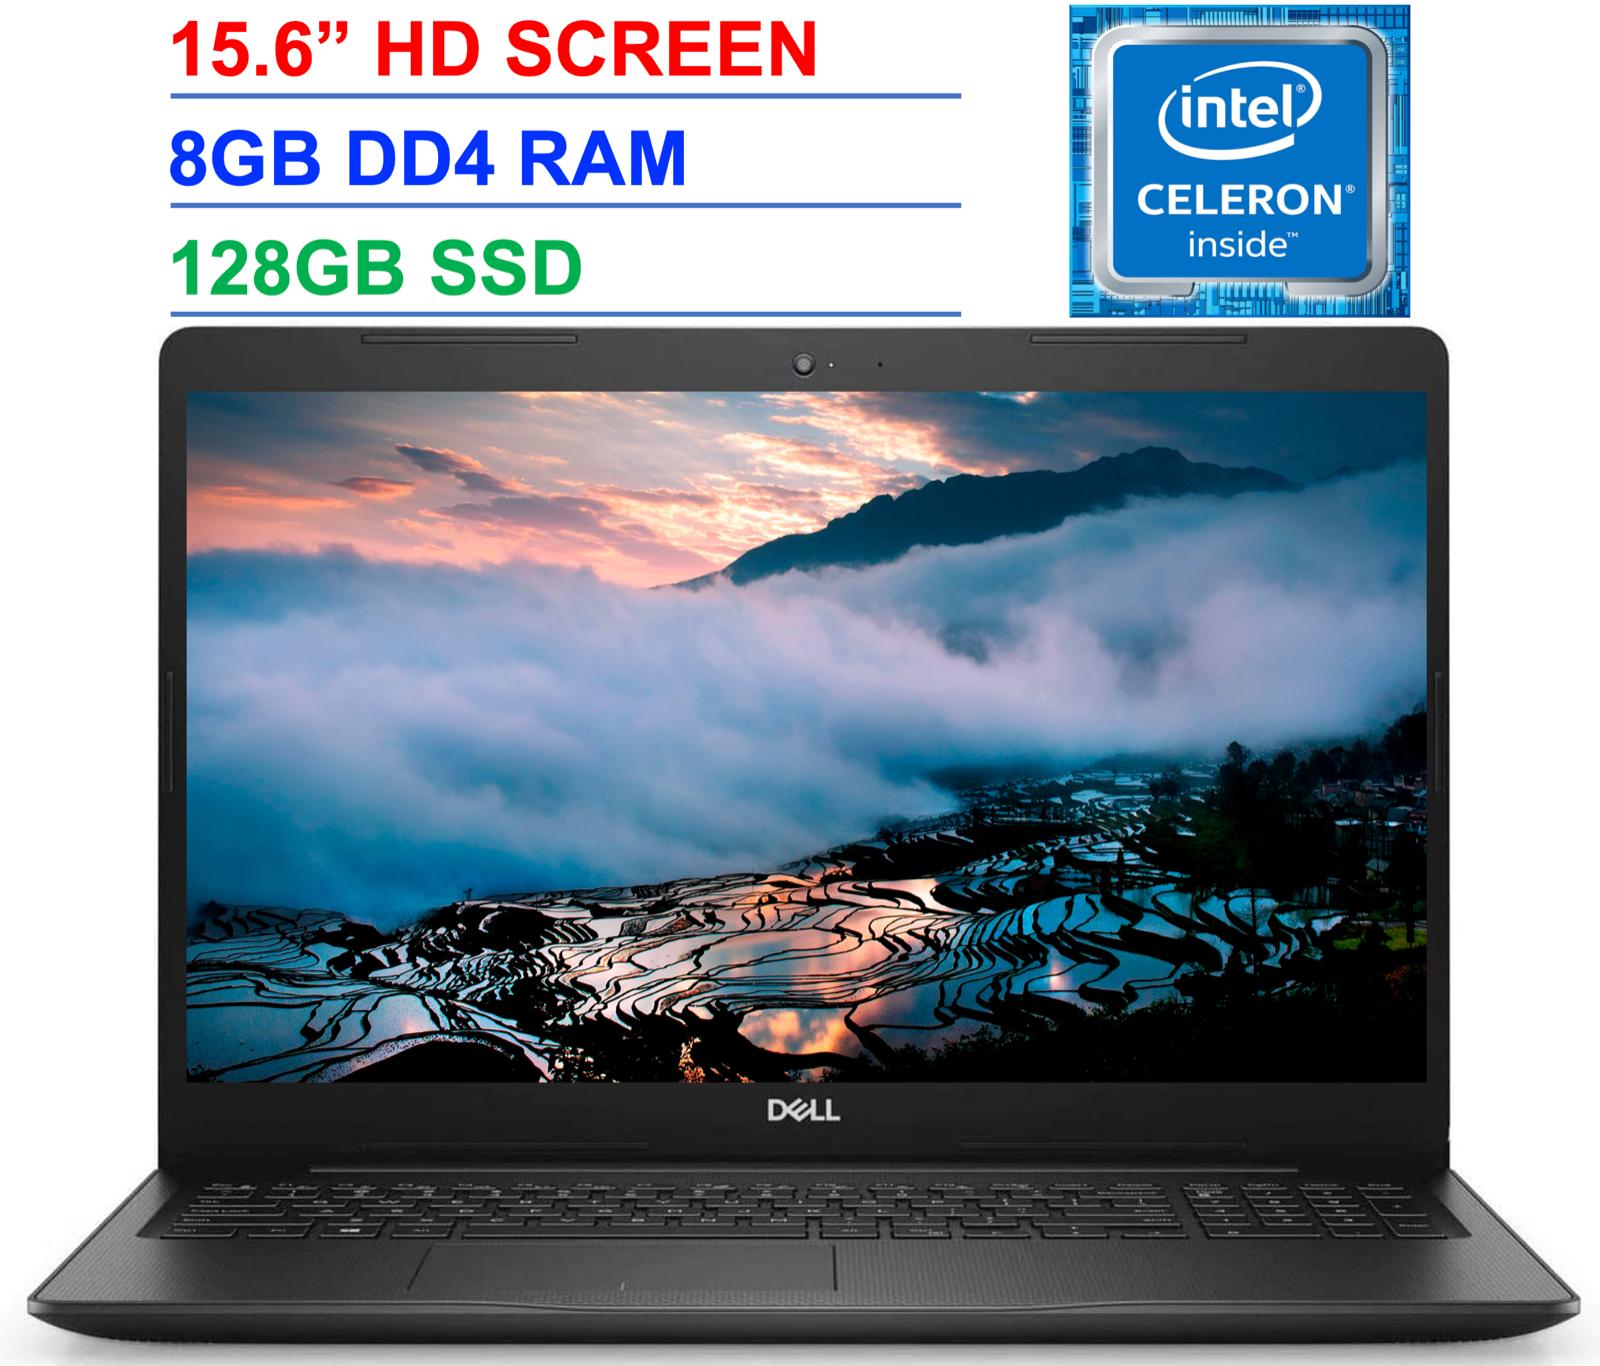 "2021 Dell Inspiron 15.6"" Laptop Intel Celeron N4020, Upto 2.8GHz, 8GB RAM 128GB"